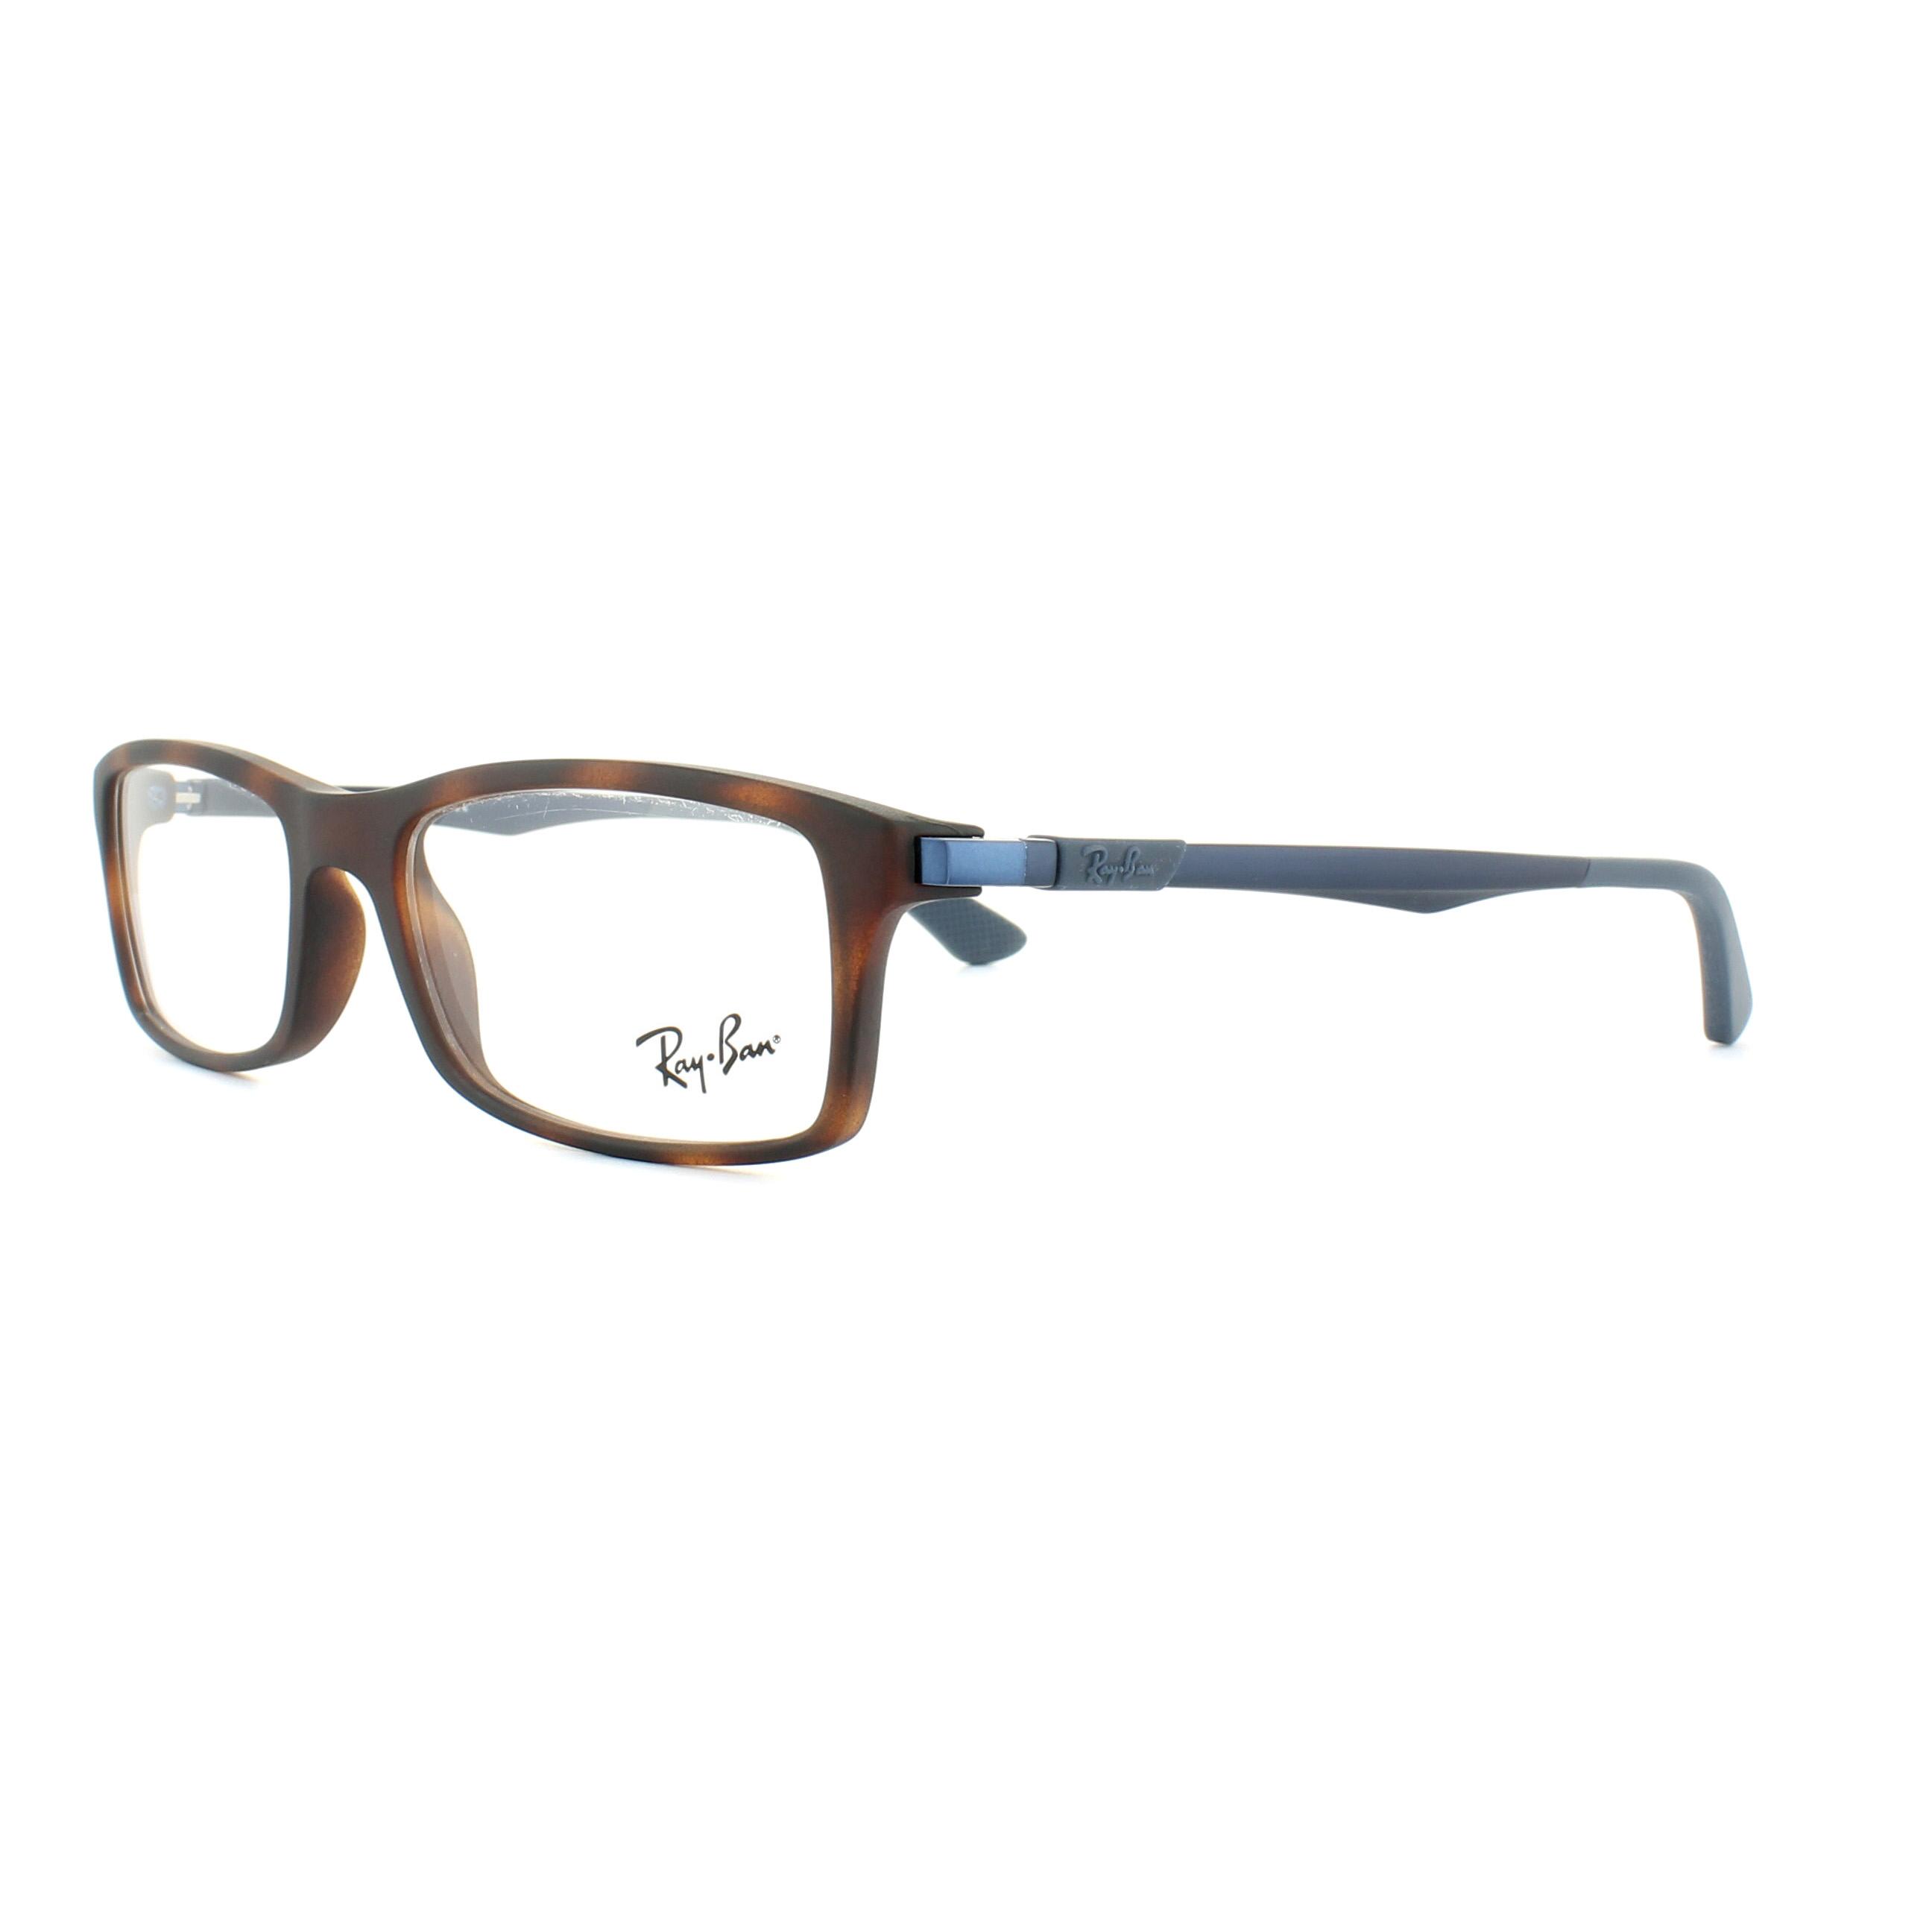 3e687a59ecf Sentinel Ray-Ban Glasses Frames 7017 5574 Matt Red Havana Blue 52mm Mens